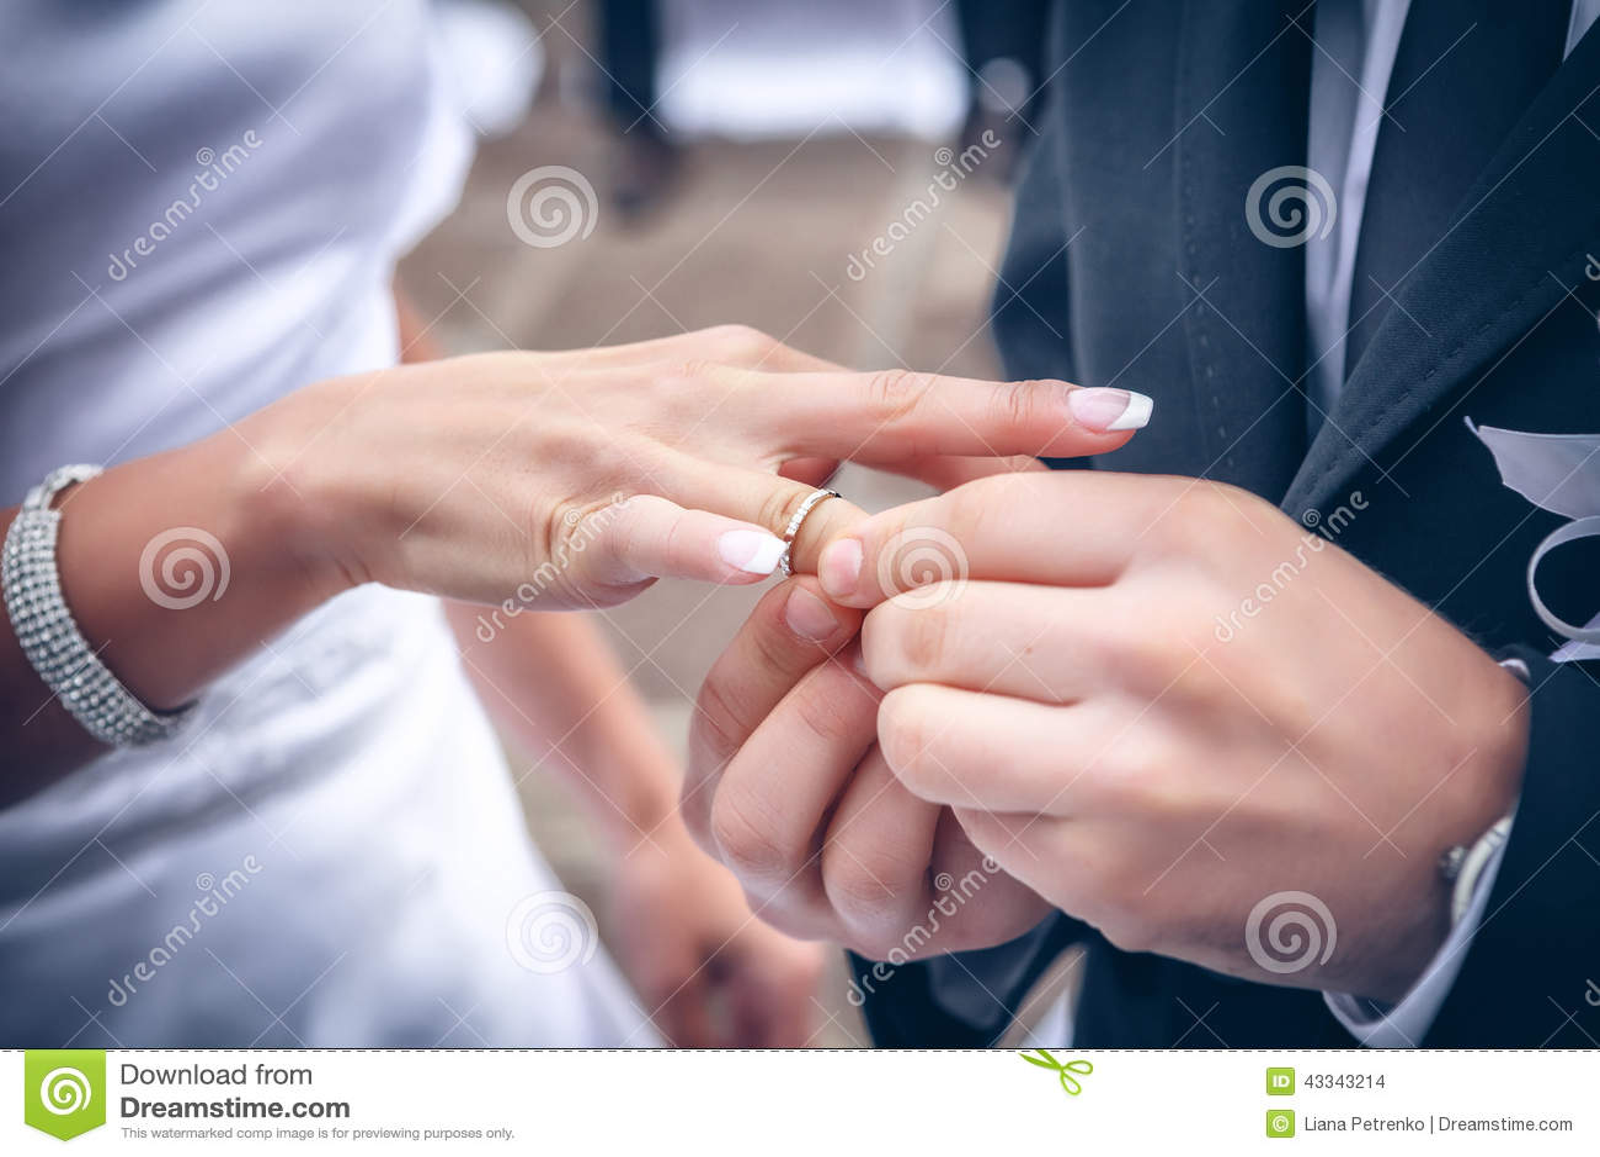 Wedding Ring Exchange Royalty-Free Stock Image | CartoonDealer.com ...